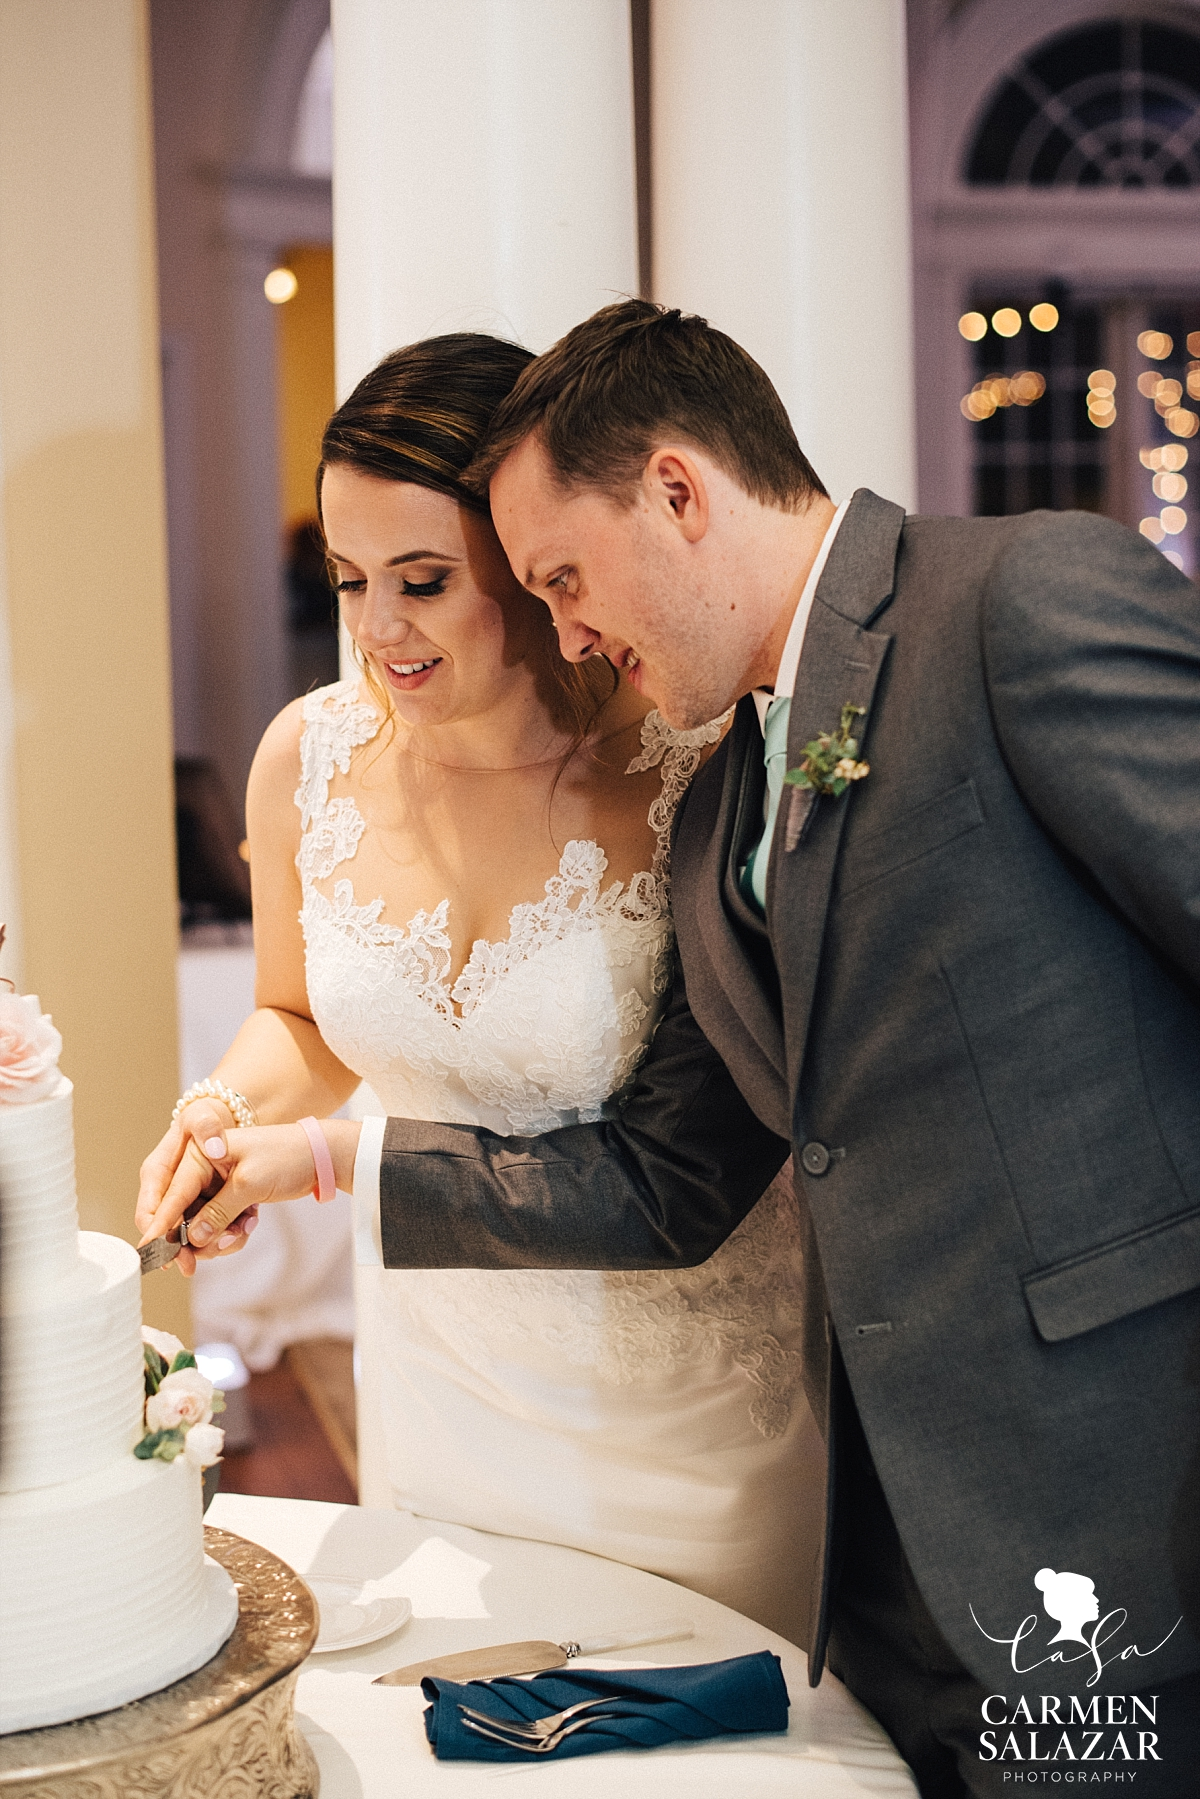 Vizcaya wedding cake cutting - Carmen Salazar